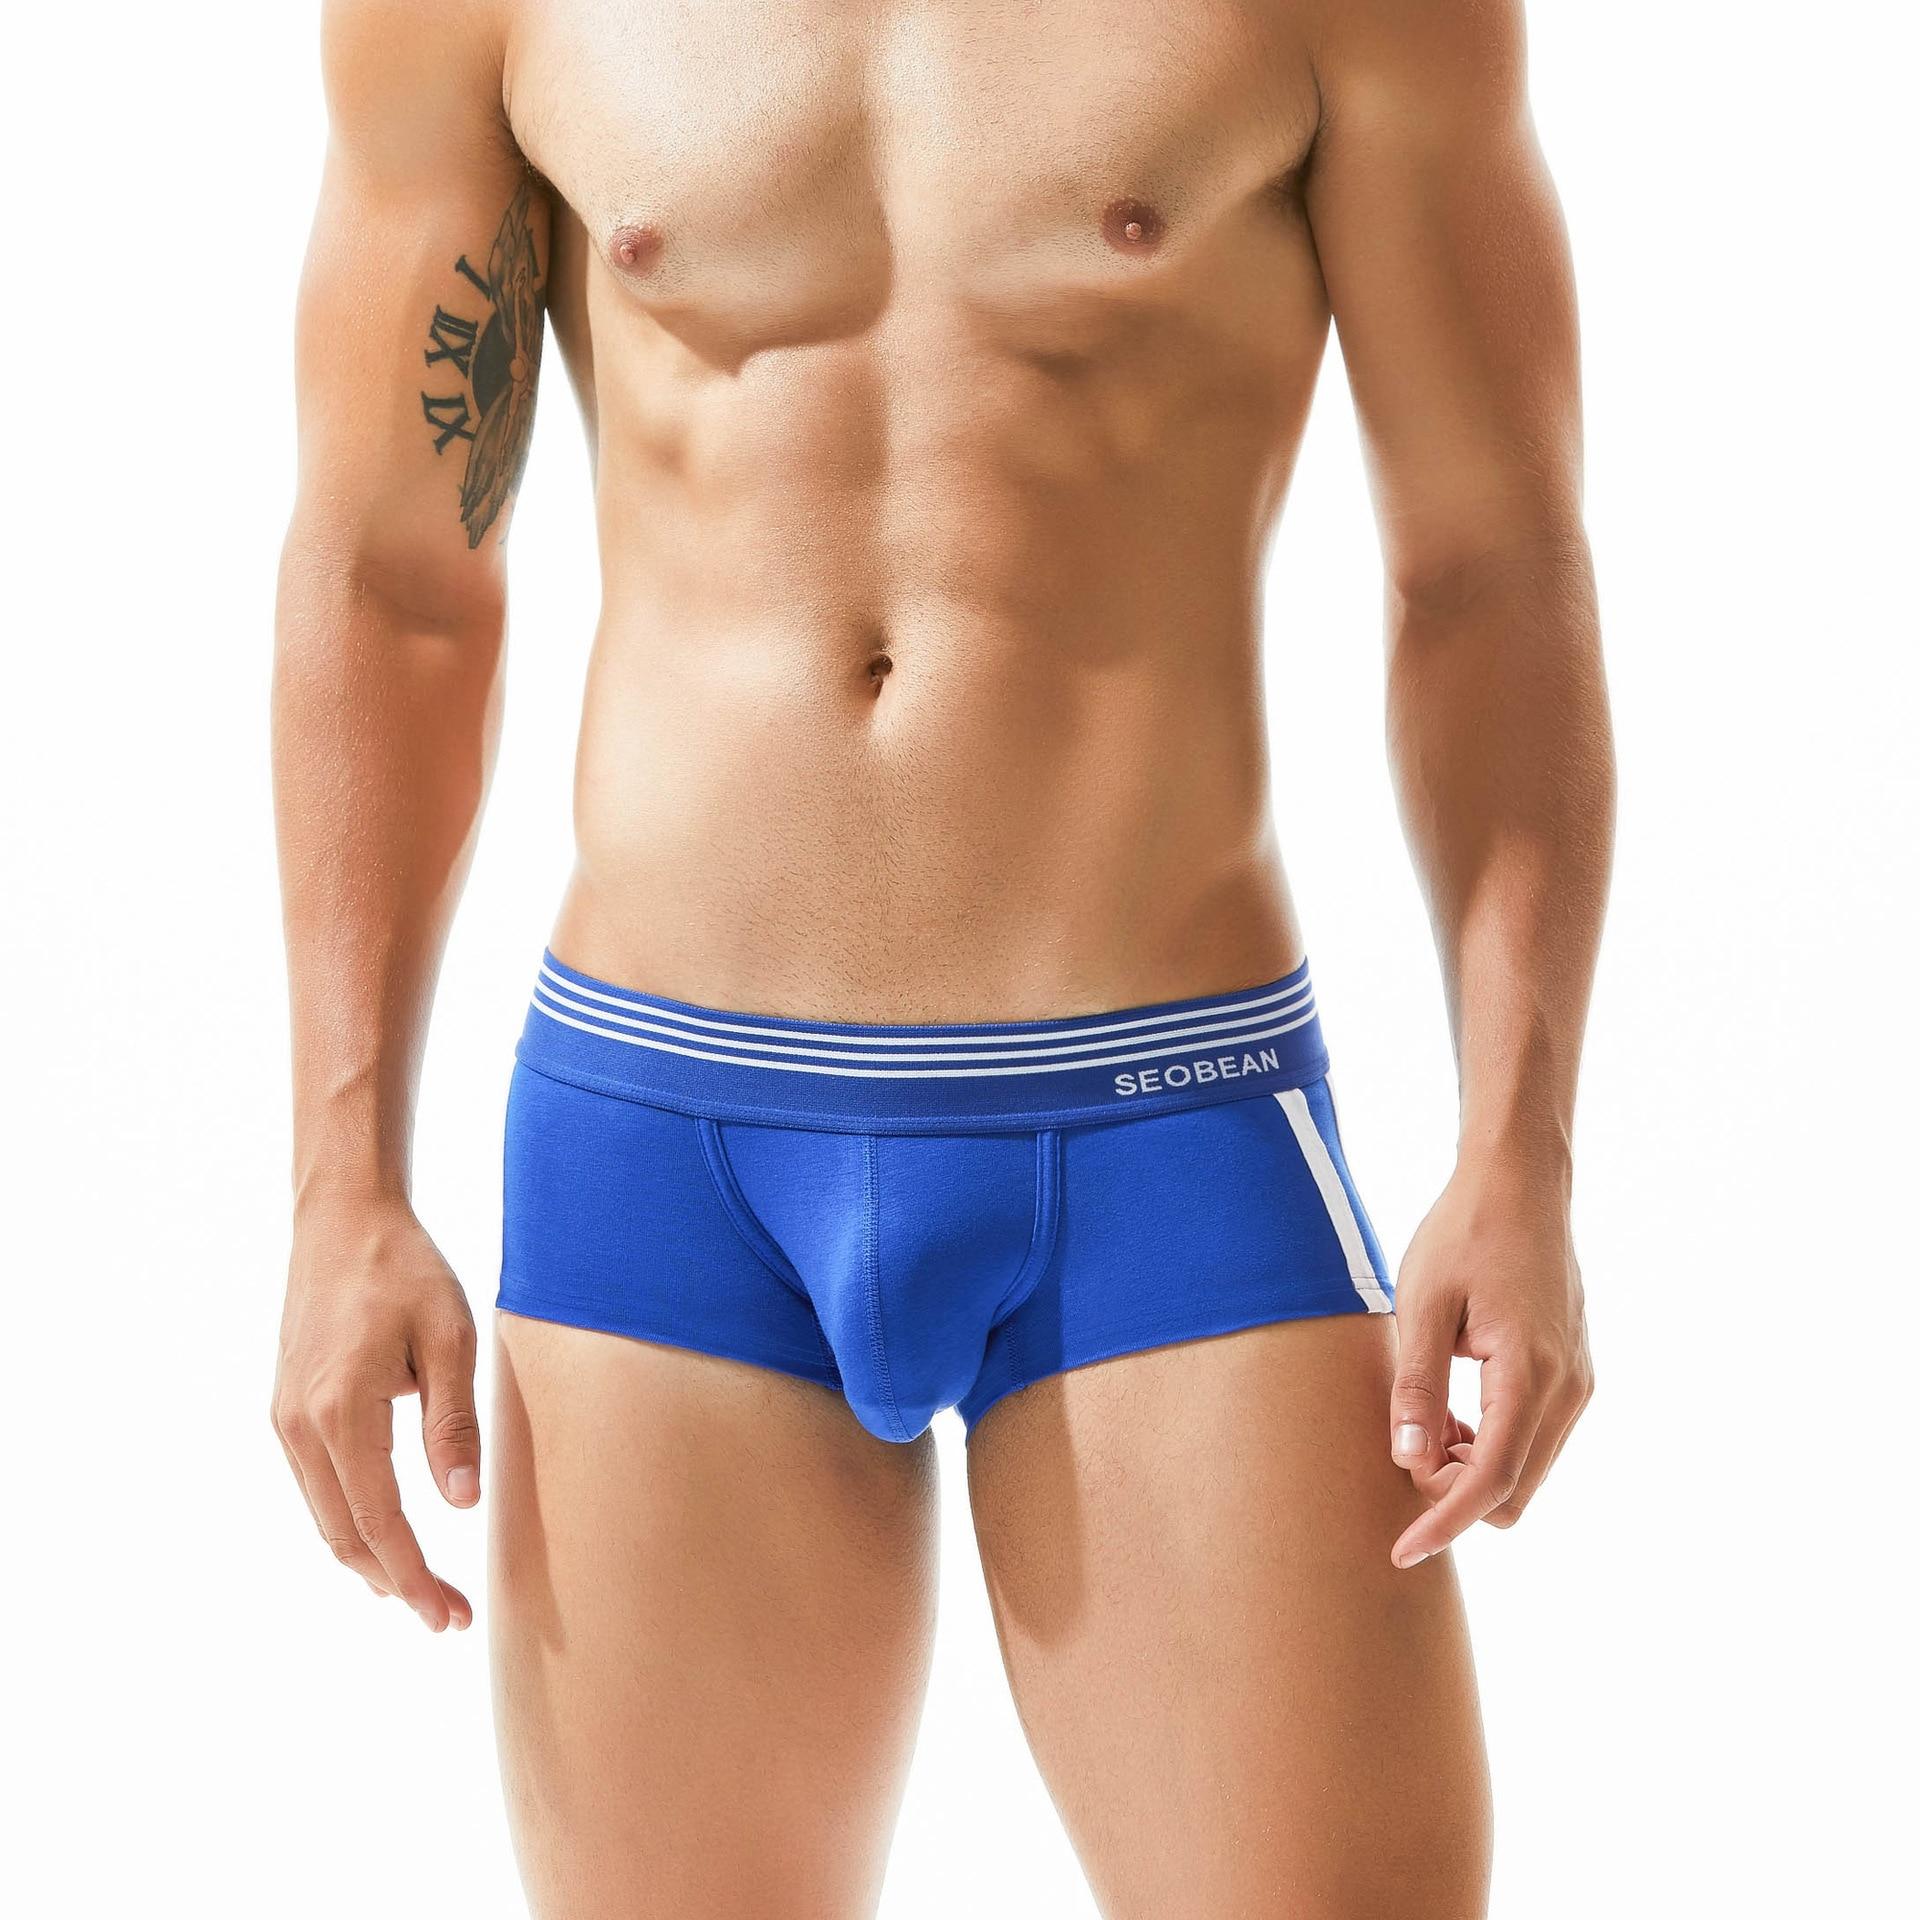 Cotton Men's Underwear Sexy Boxers Trunks Gay Penis Pouch Tight Boxershorts Men Ropa De Hombre 2018 calsoncillos hombre